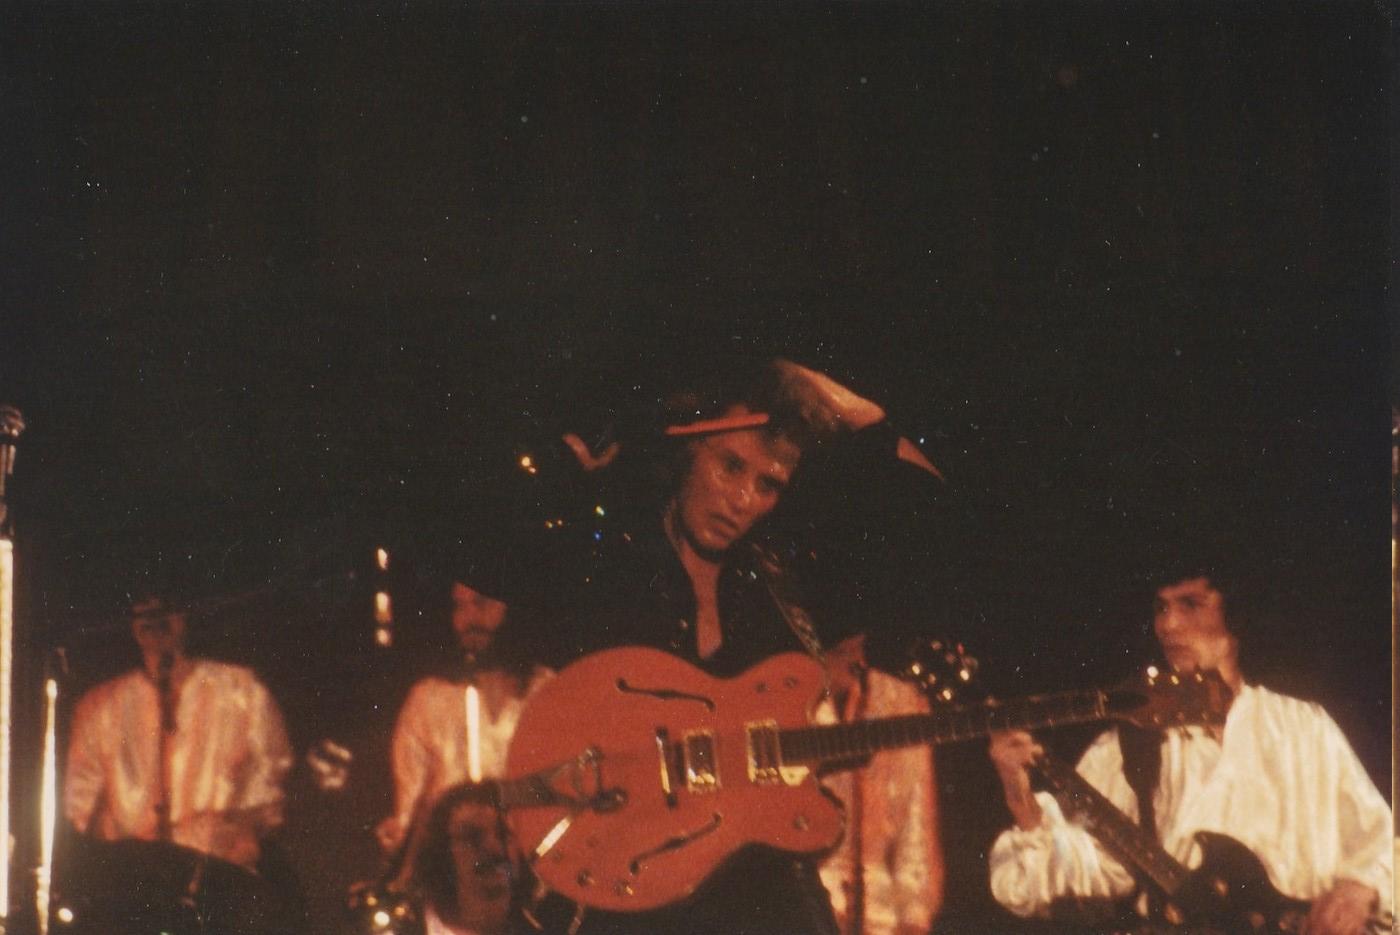 INÉDIT  :  JOHNNY HALLYDAY EN TOURNEE - HIVER 1978 -1979 ( PHOTOS INÉDITES )   Img_2636